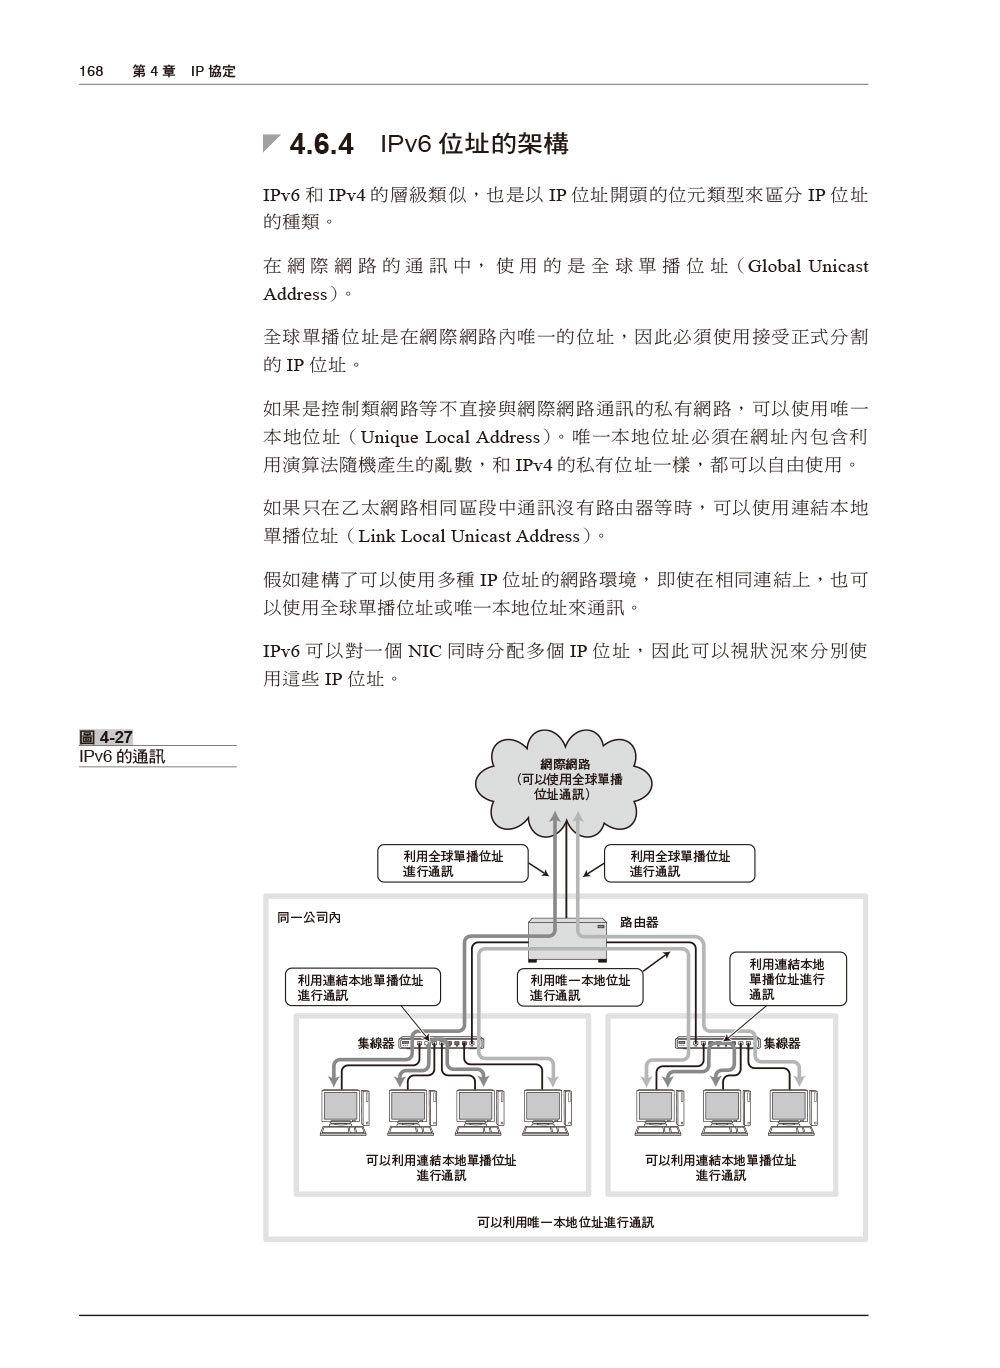 圖解 TCP/IP 網路通訊協定 (涵蓋IPv6)-preview-12